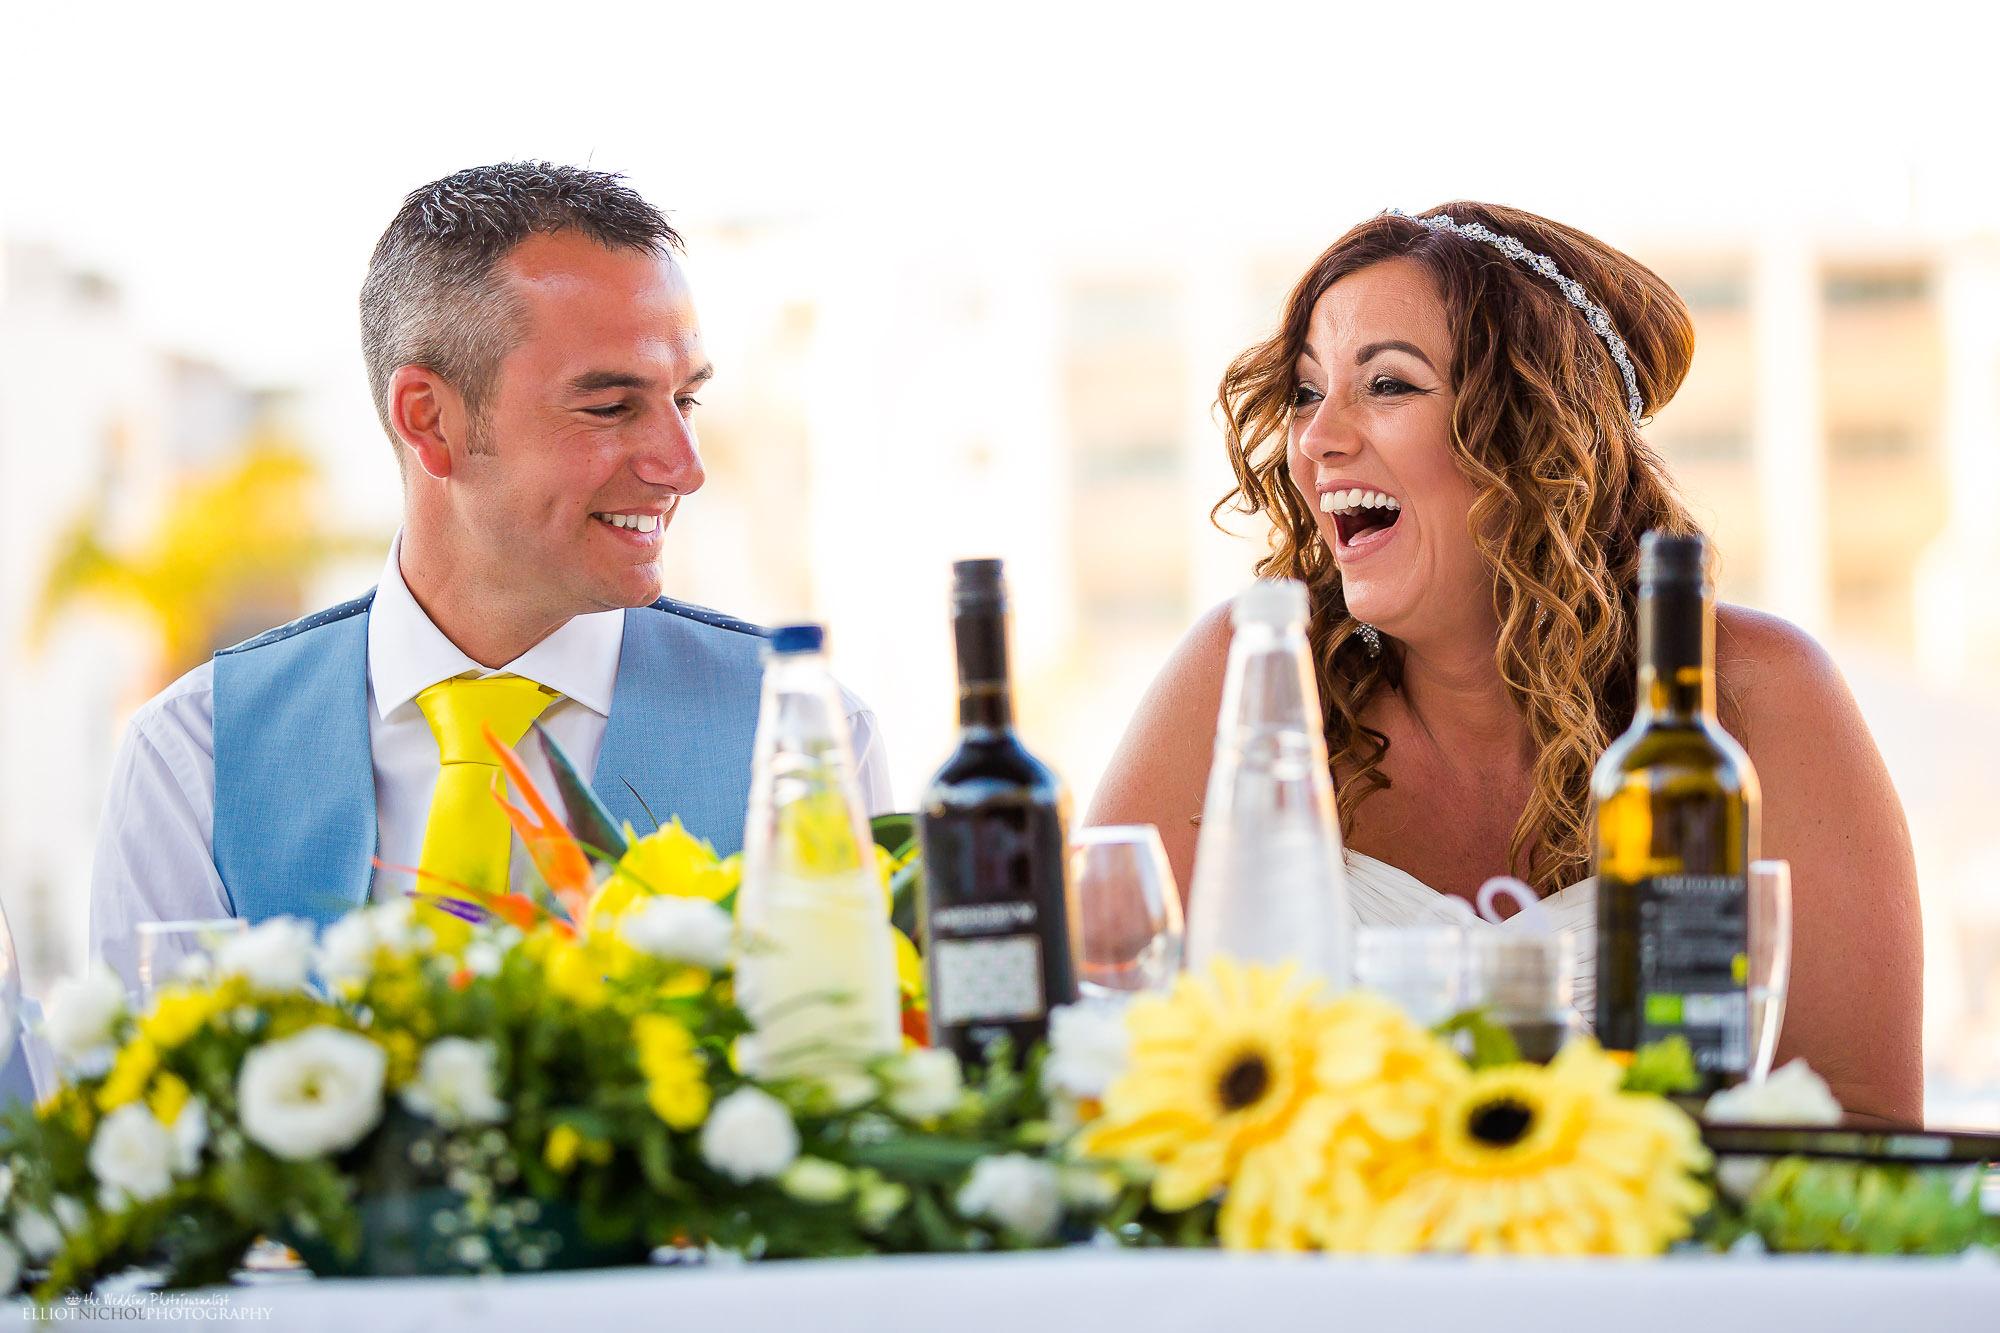 bride-groom-wedding-reception-speech-reaction-photo